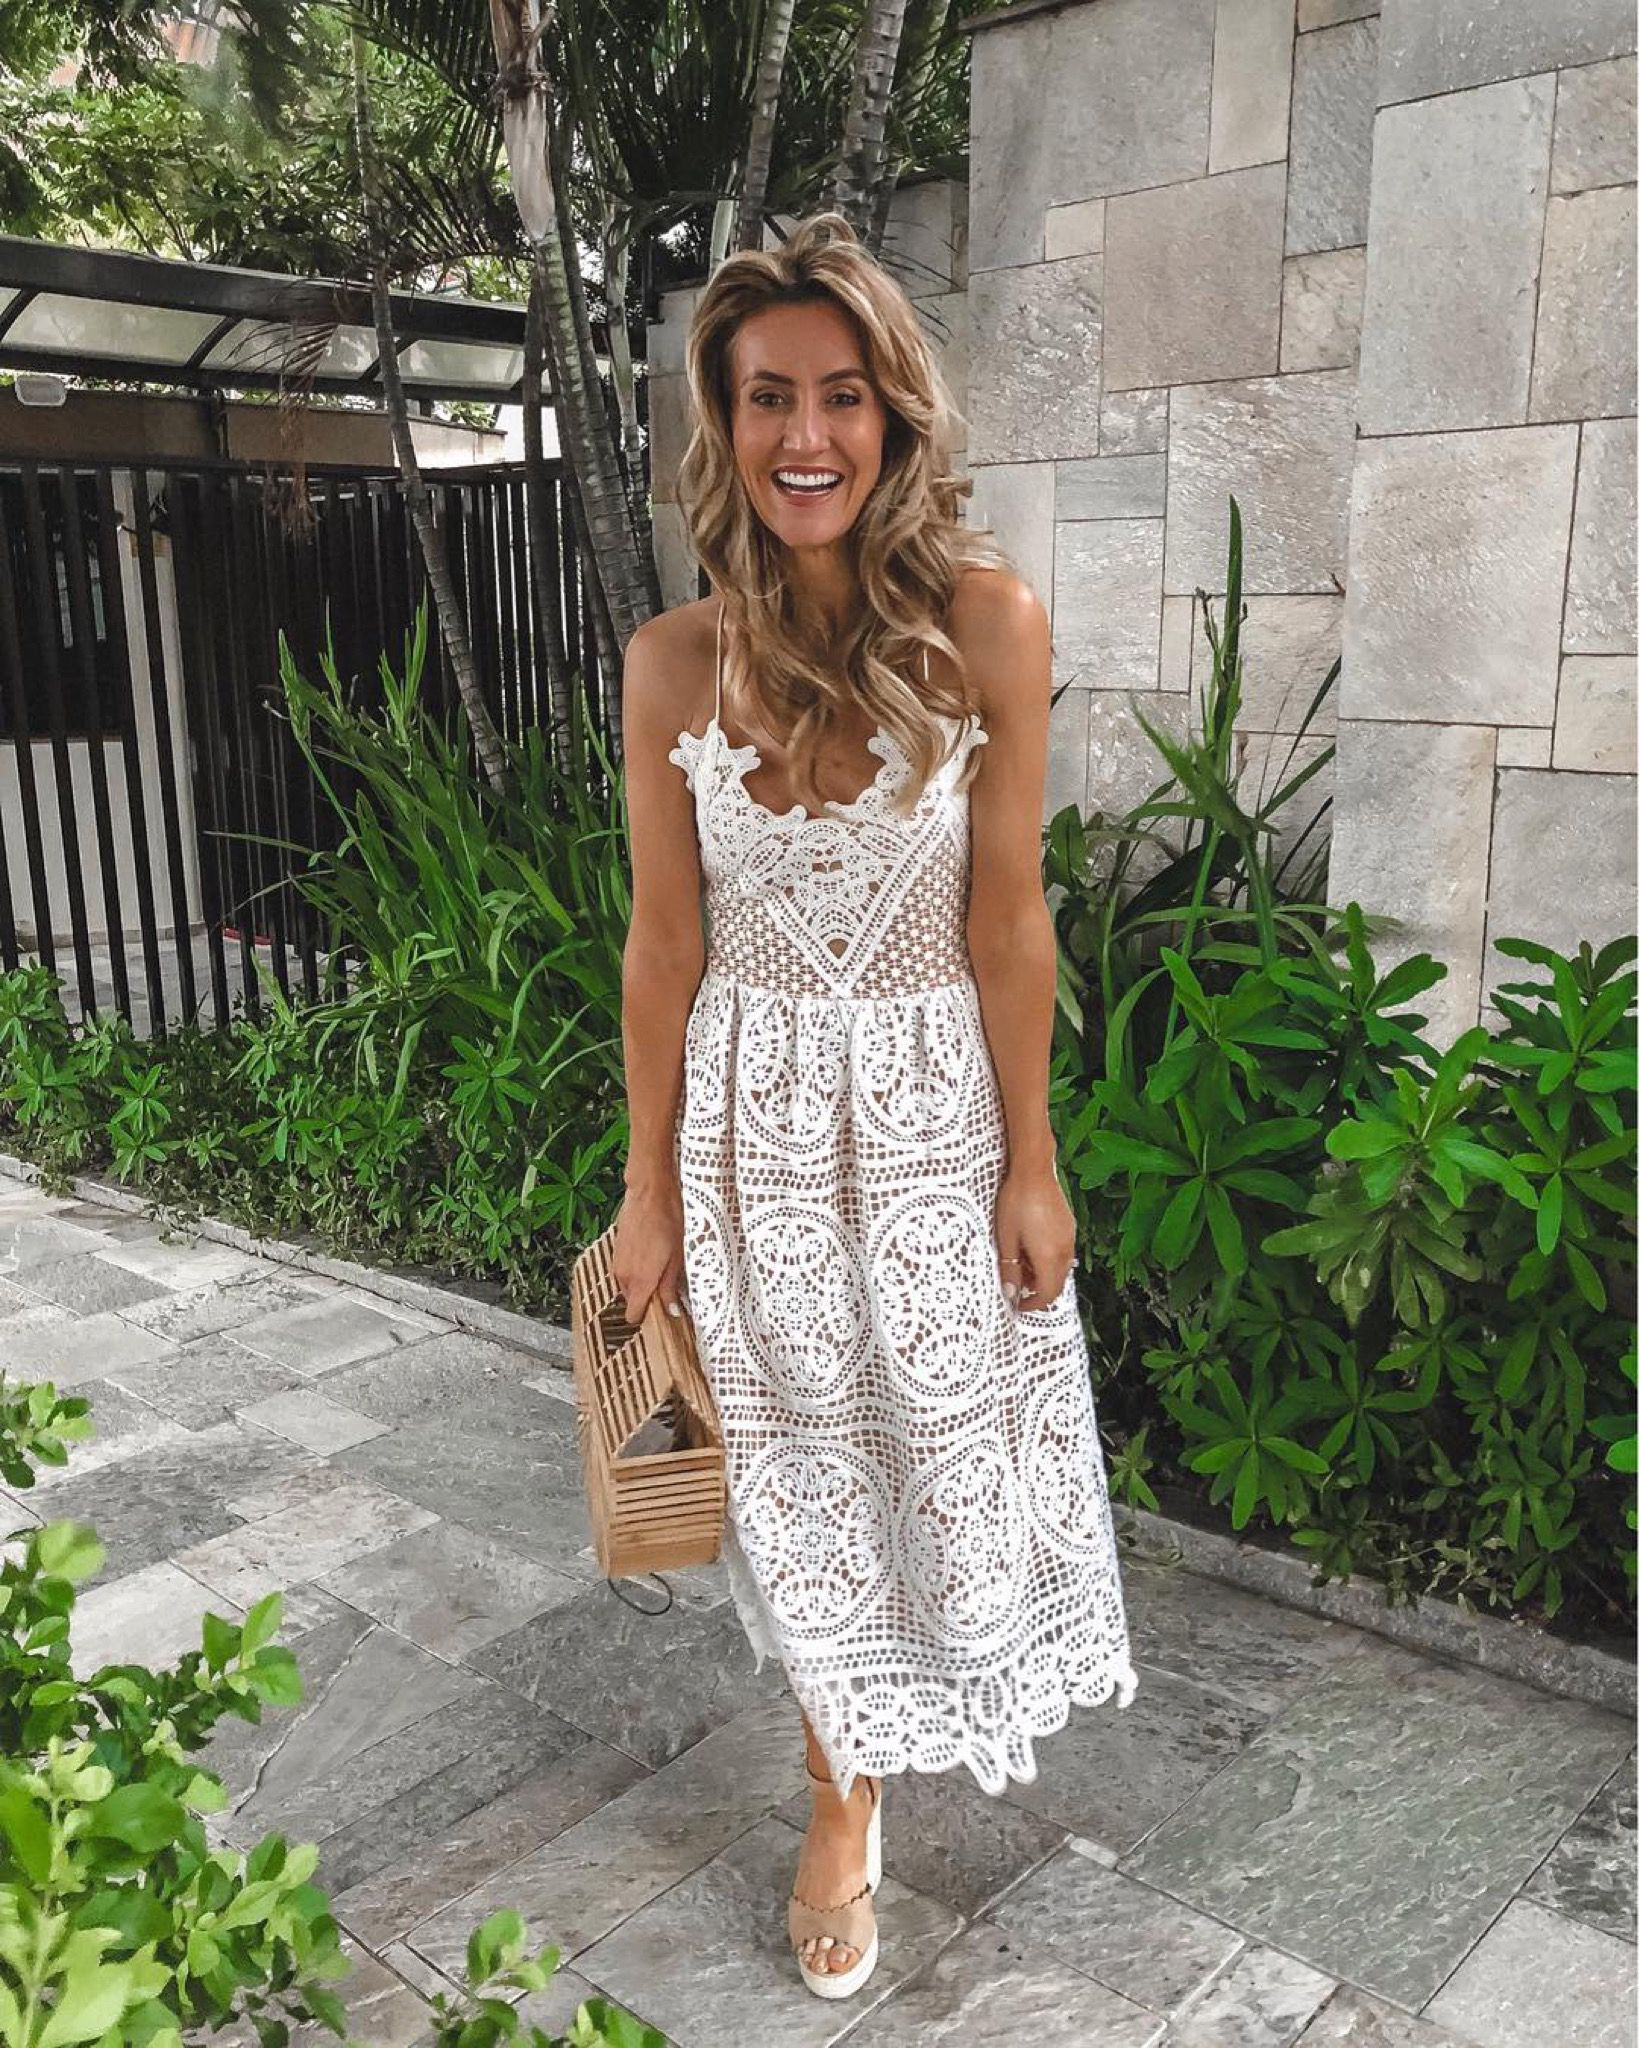 Fashion Blogger Karina Reske White Lace Dress Midi Lace Dress Bamboo Bag Wedding Season Dress Rehe White Lace Midi Dress Lace White Dress White Dress [ 2048 x 1639 Pixel ]